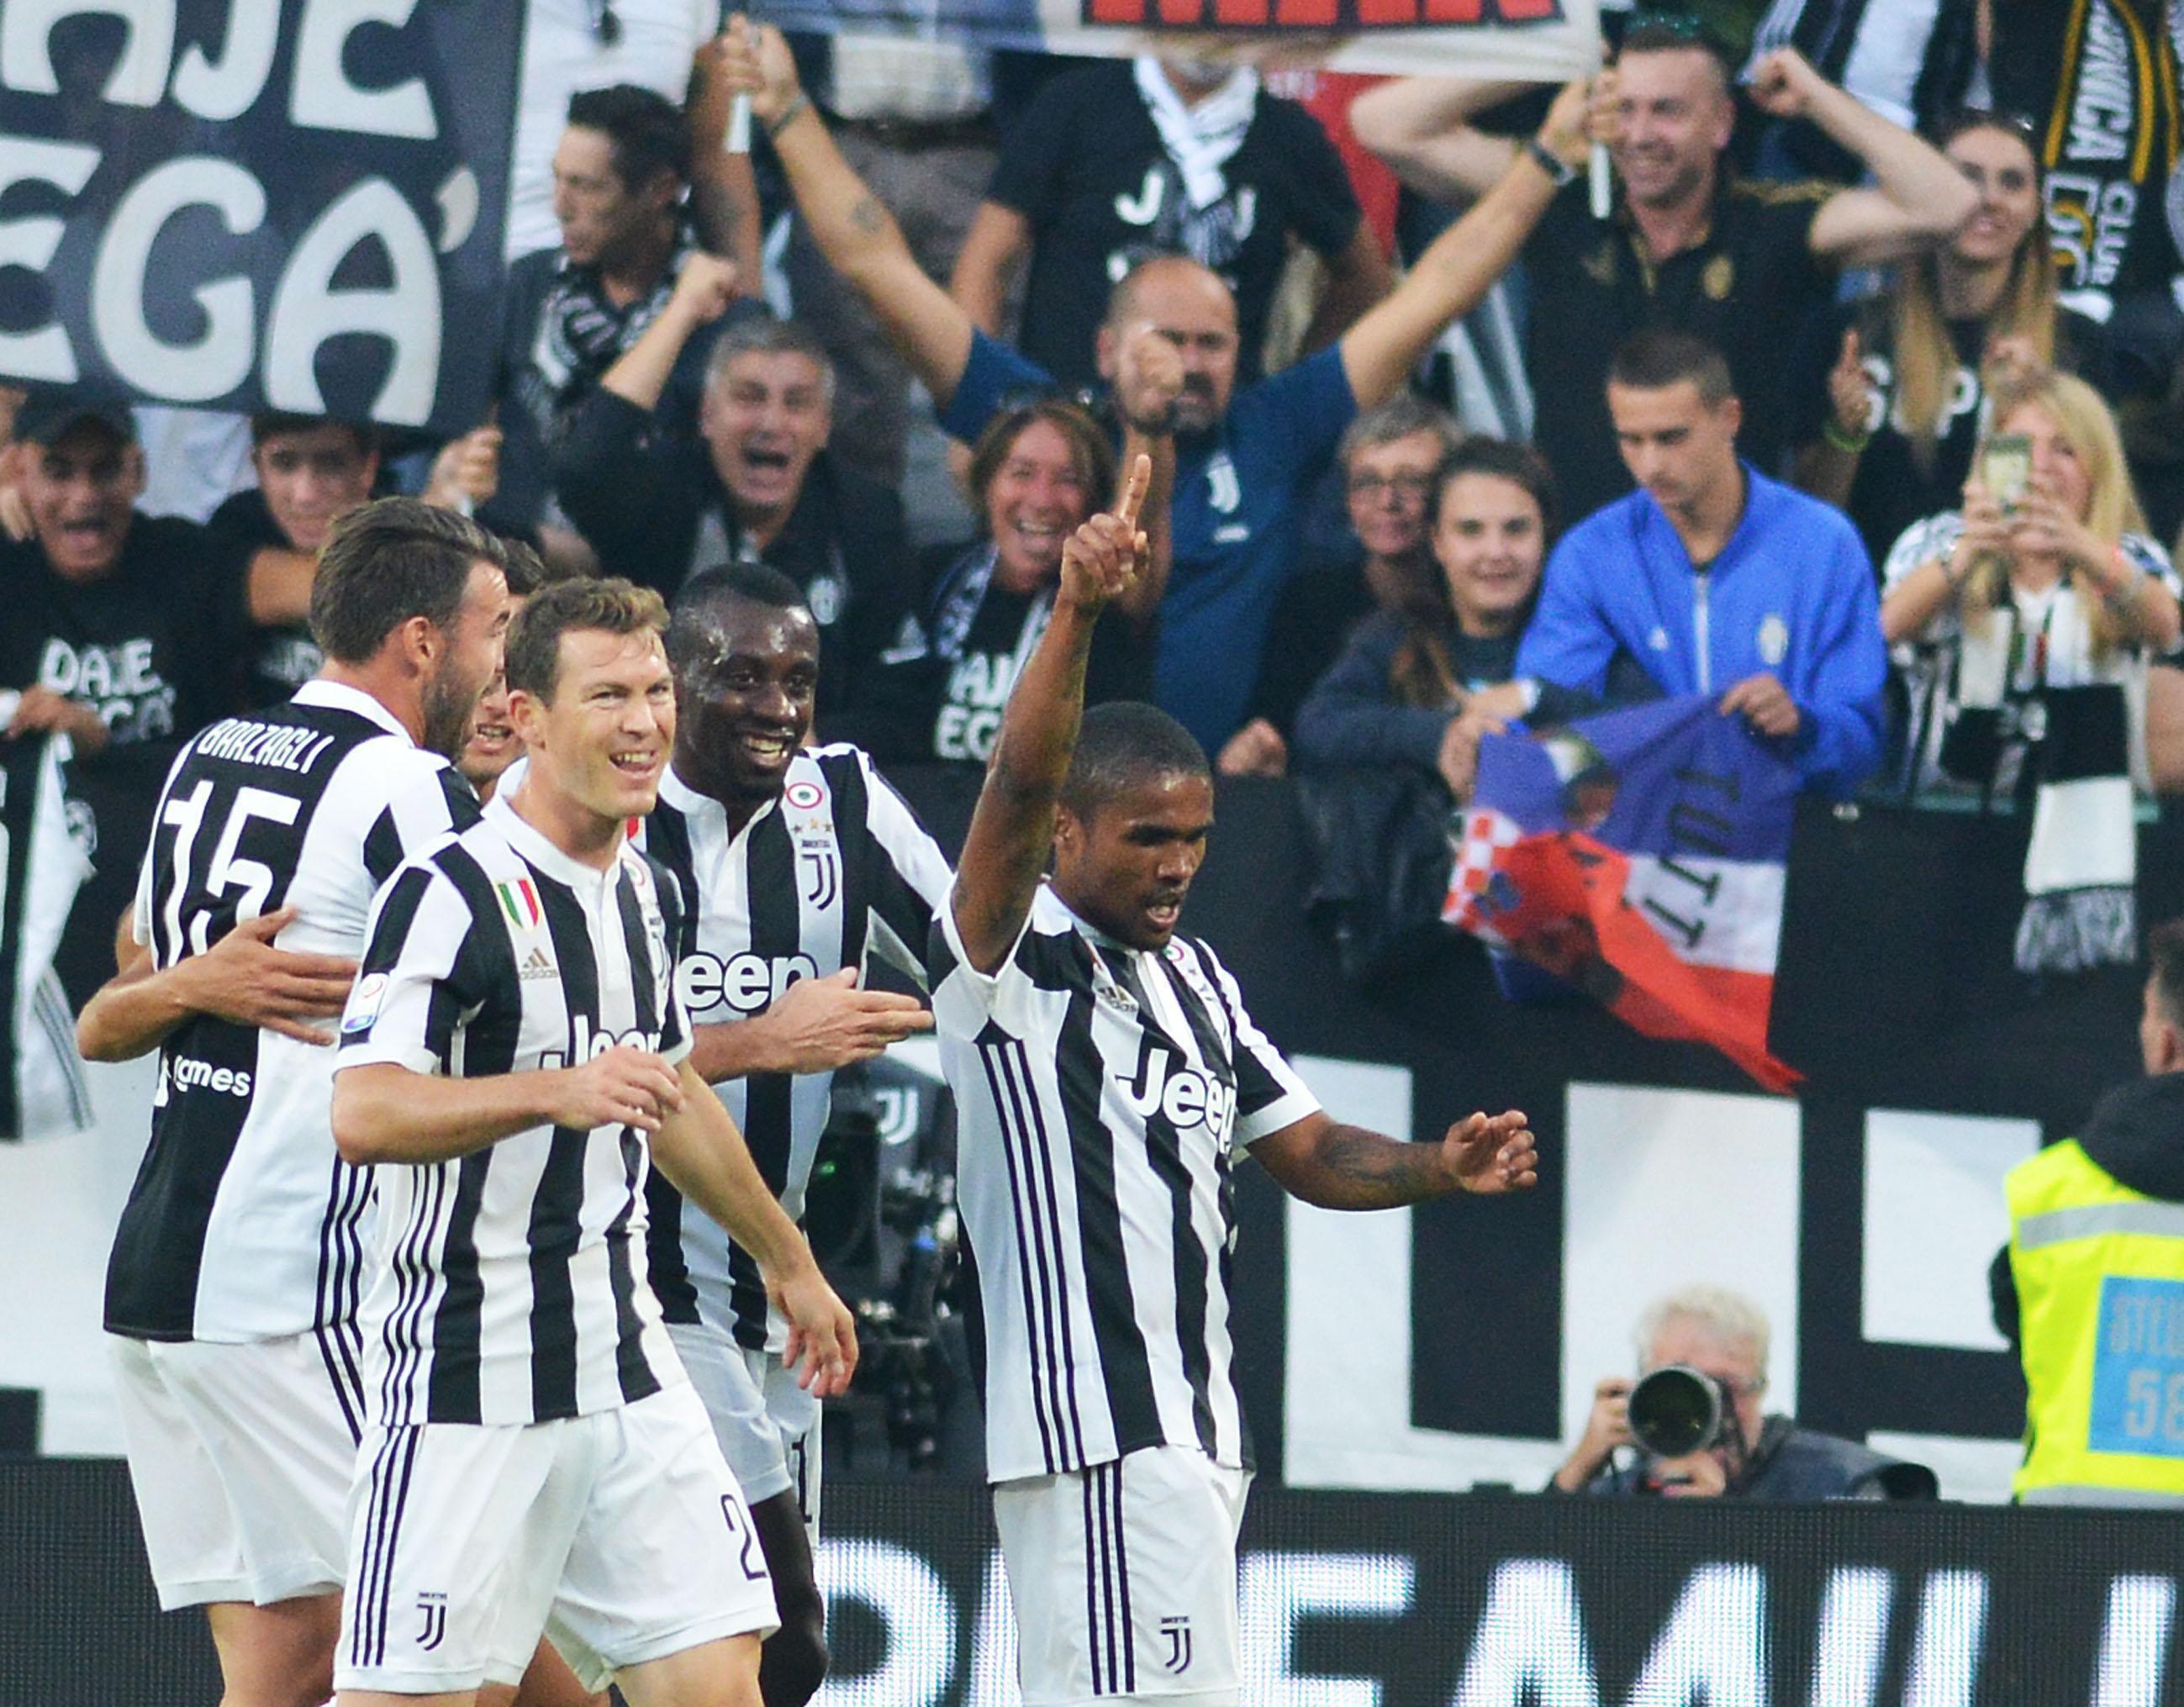 Douglas Costa seems to be enjoying life at Juventus after a mixed time at Bayern Munich